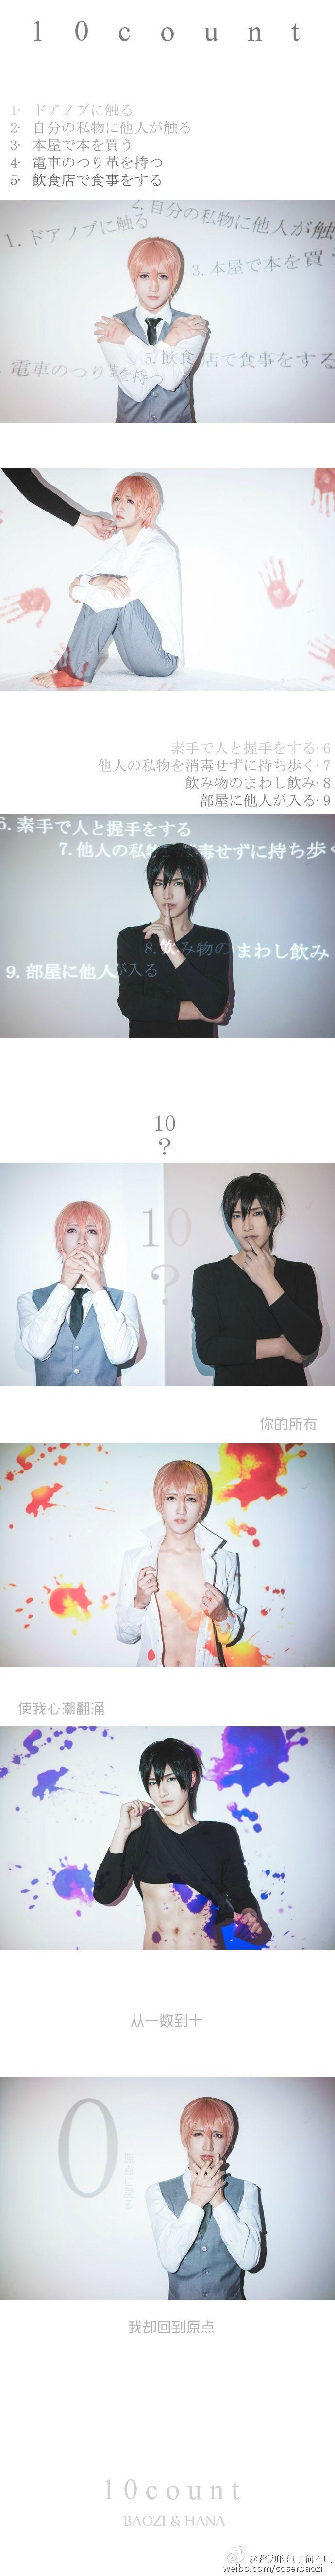 Bishie hunter,Ulzzang,Ikemen & Boys Love!! ver.4 - Komik,Manga,Anime & Kartun - Hobi & Koleksi - CARI Infonet